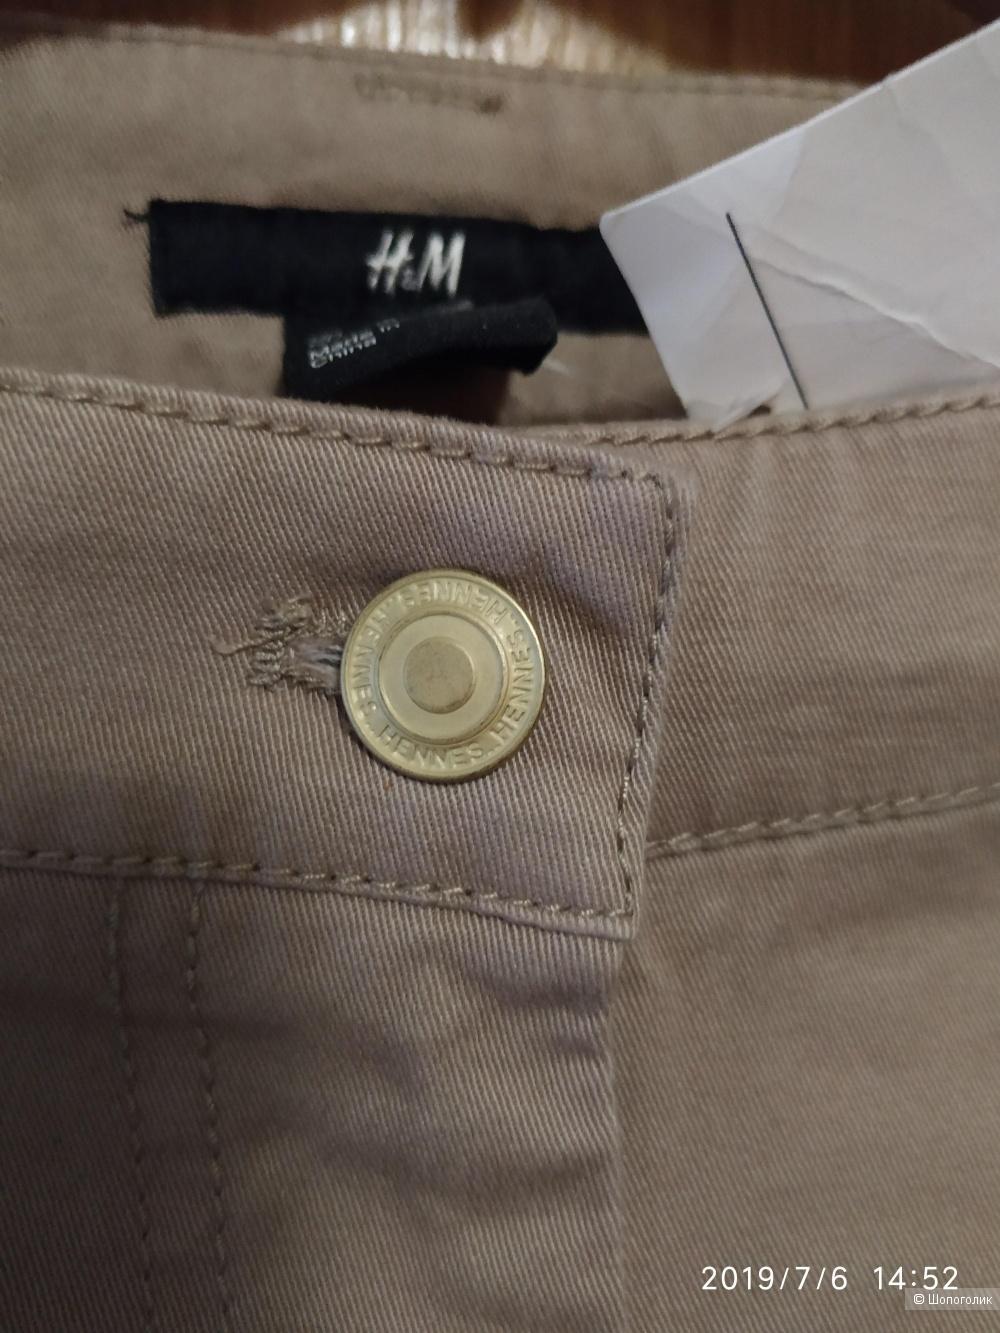 Брюки H&M размер 36 европейский